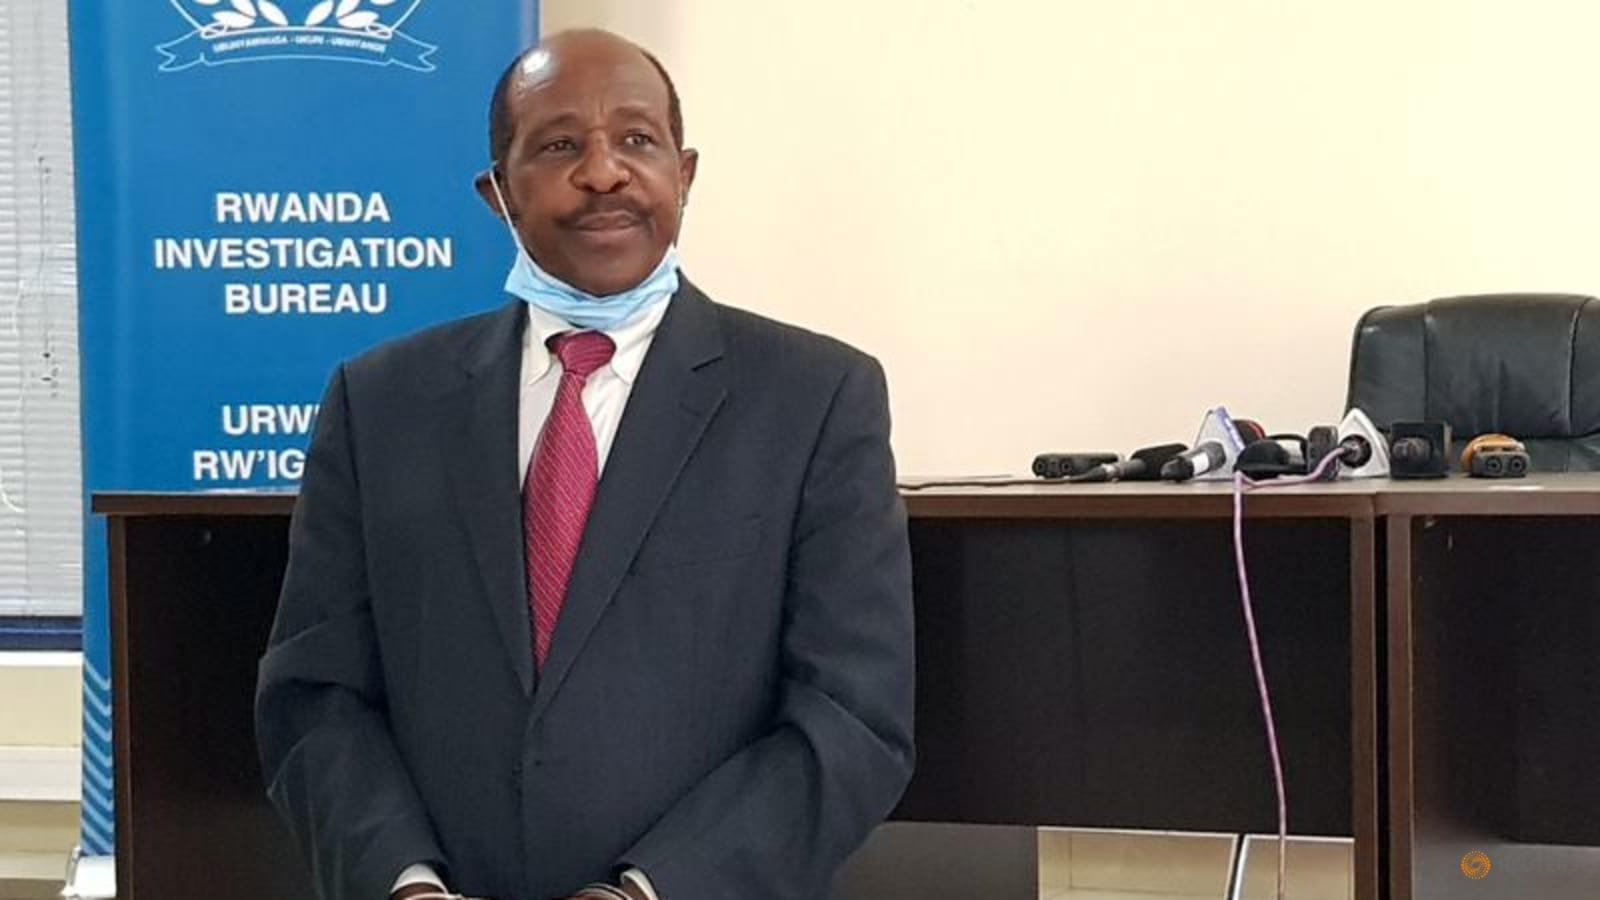 Rwandan court finds Hotel Rwanda film hero guilty in terrorism case